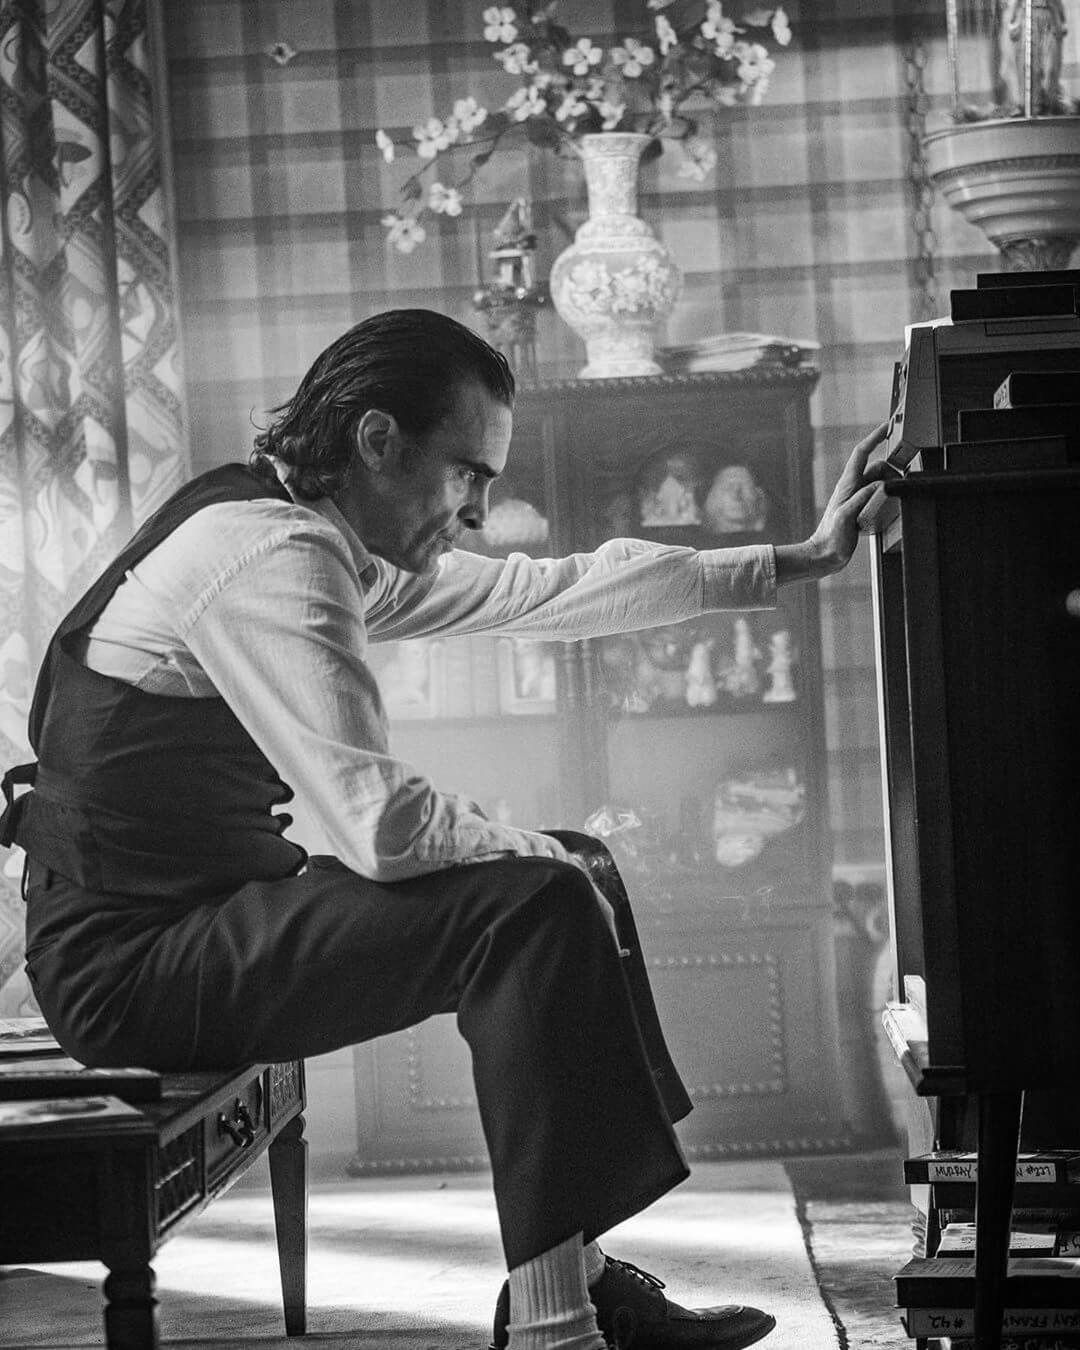 trailer final de Joker de DC con Joaquin Phoenix